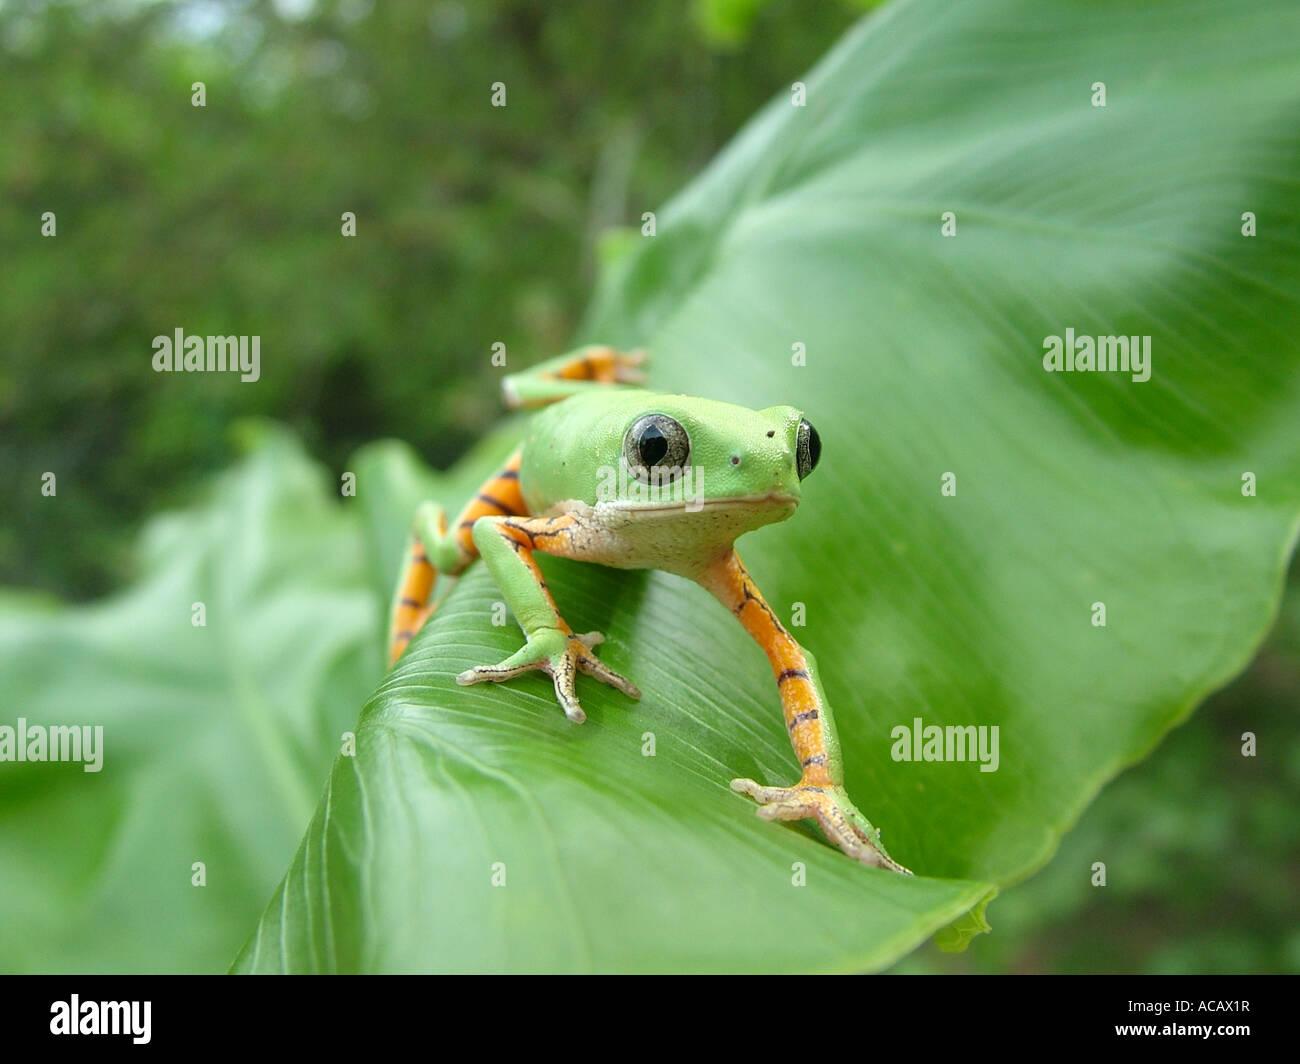 Green monkey tree frog (Phyllomedusa hypochondrialis azurea) crawling on banana a leaf, Gran Chaco, Paraguay - Stock Image